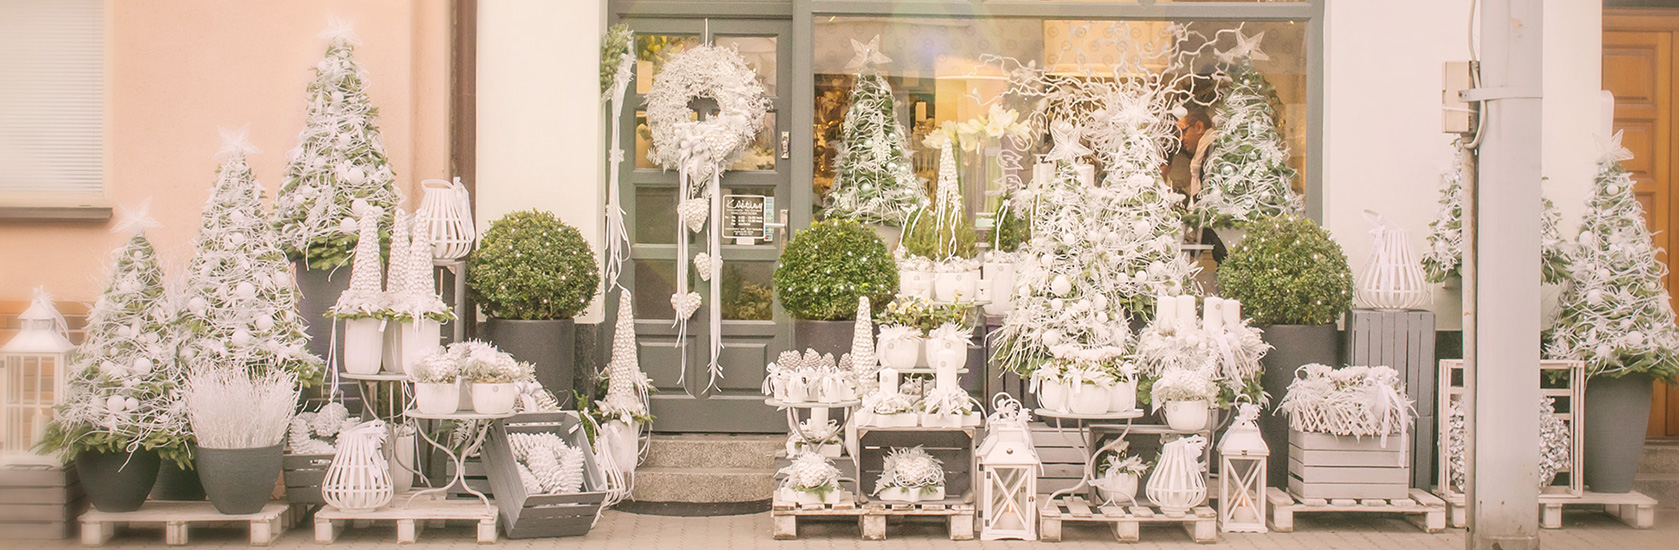 Kolekce Luxusni Vanoce V Brne 2017 Kvetiny Petr Matuska Brno